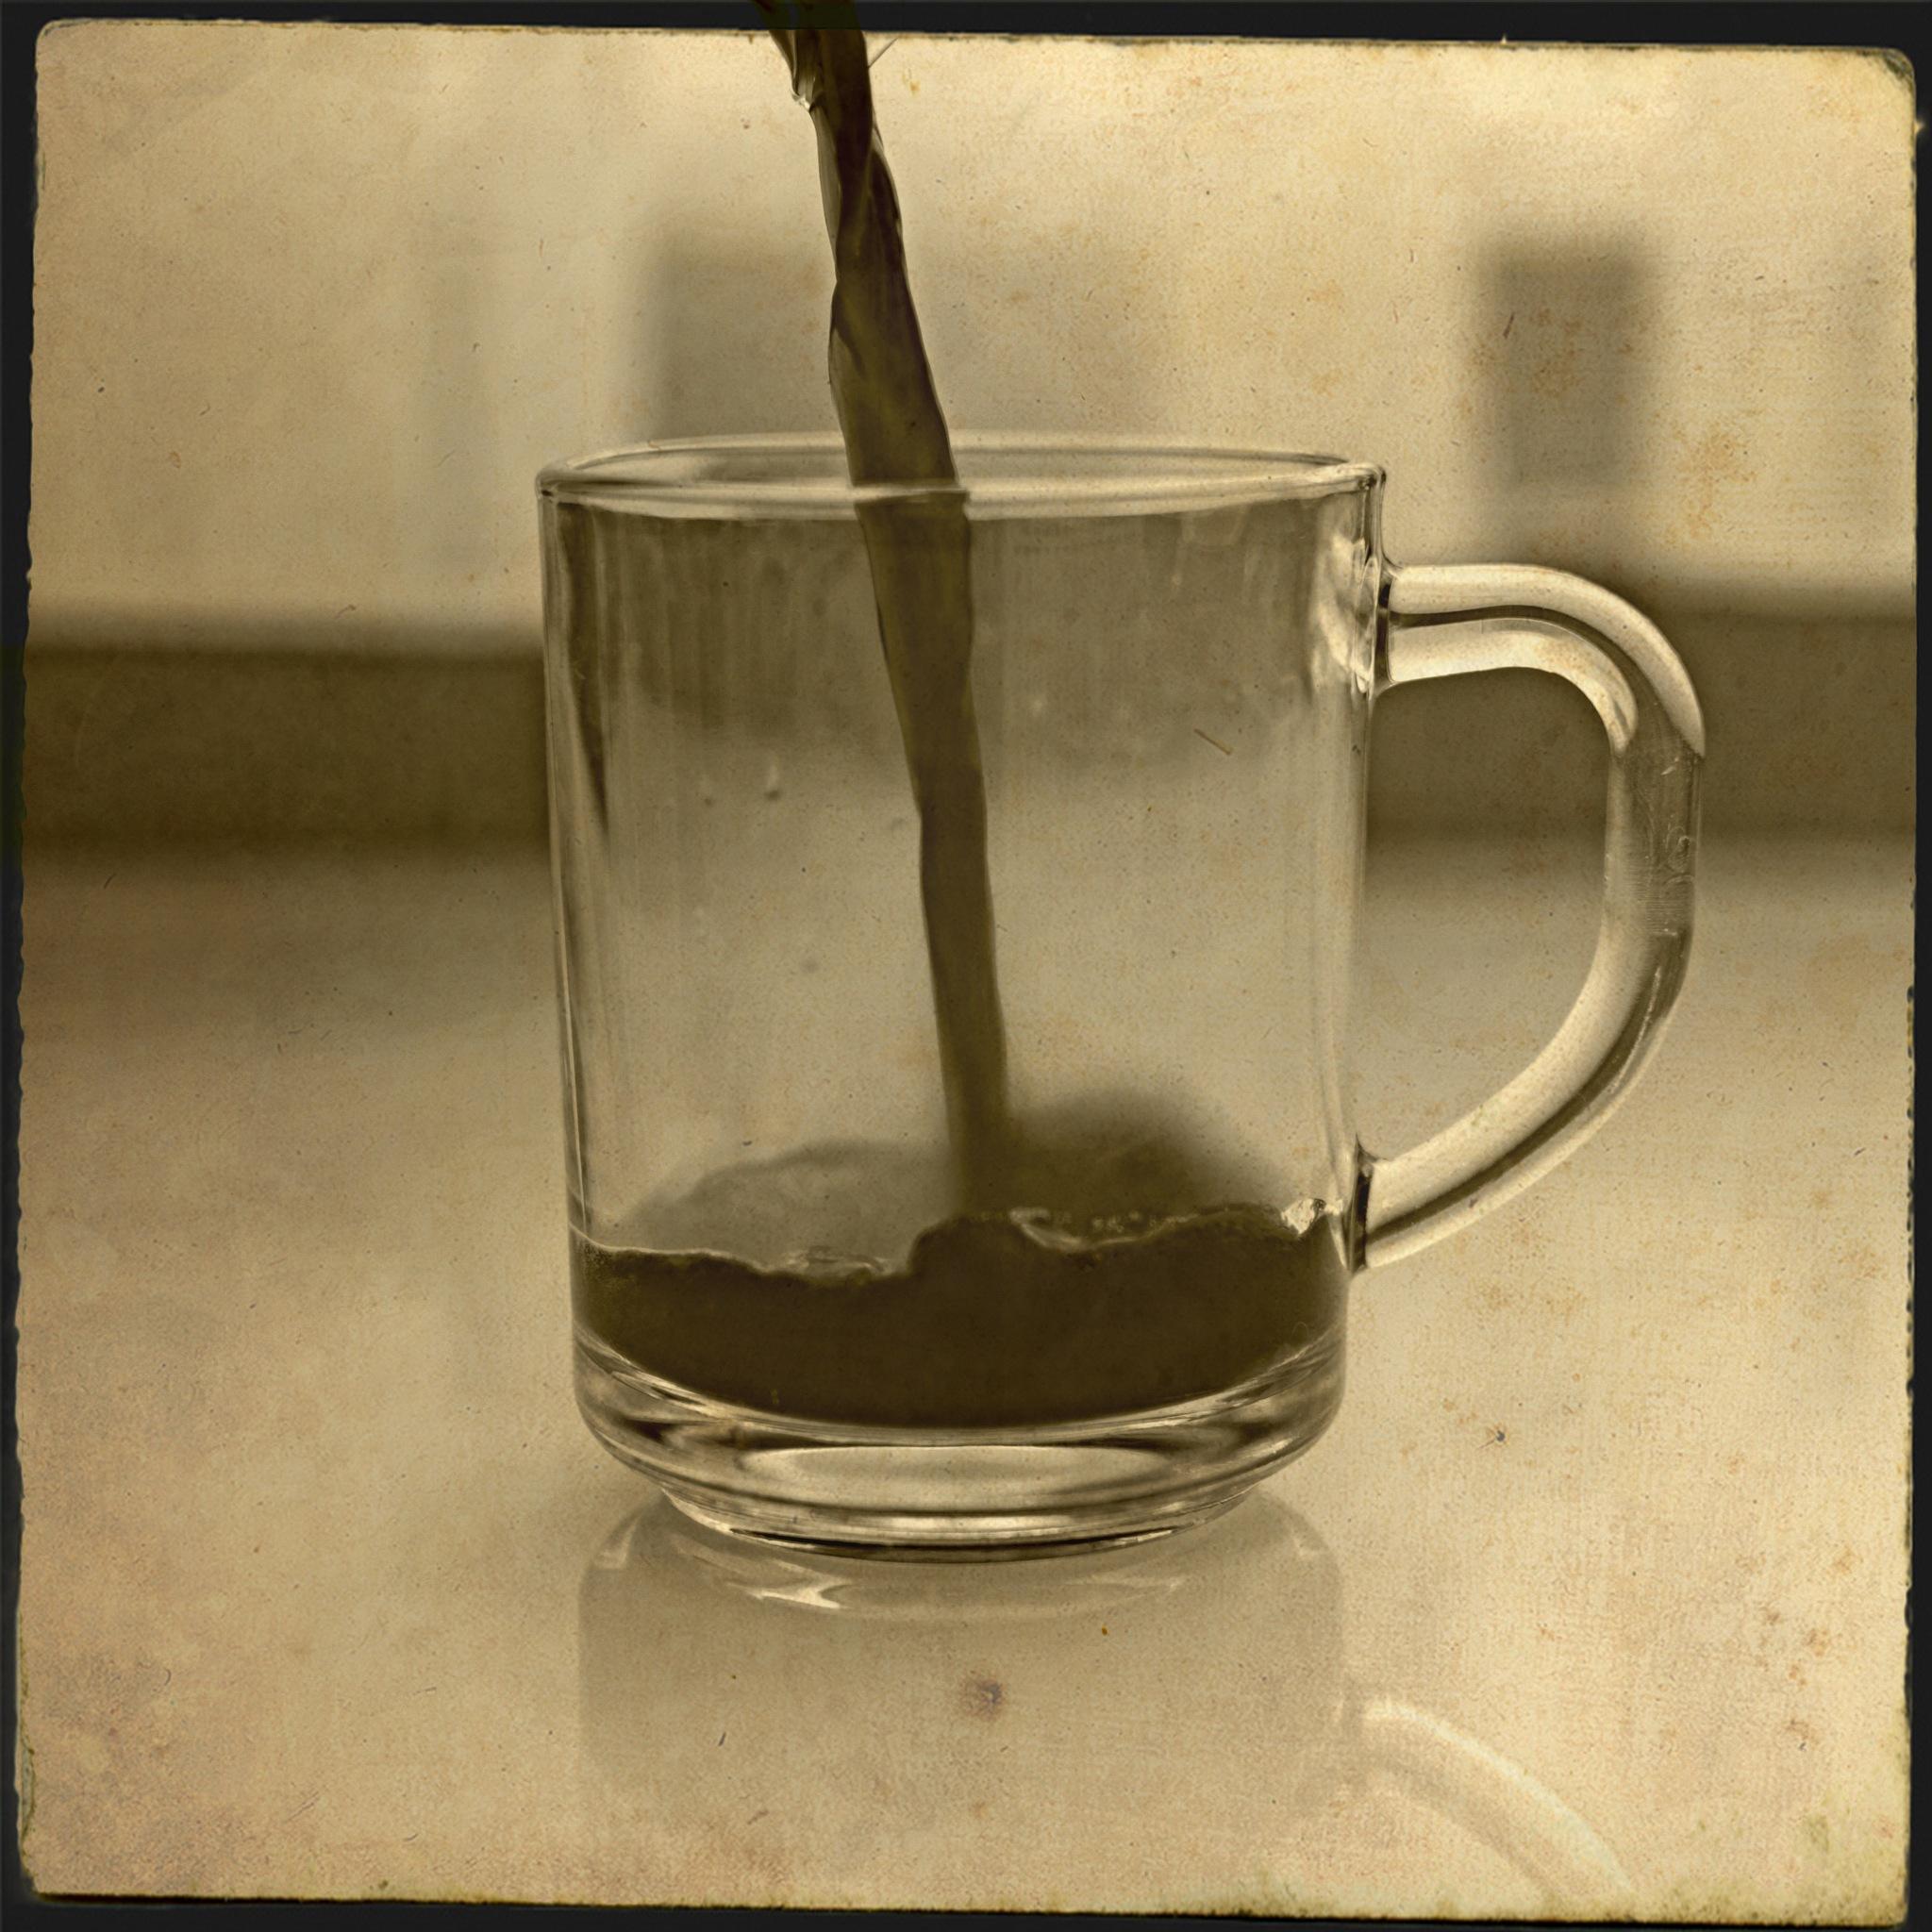 Oldschool coffee by Szabó Viktor